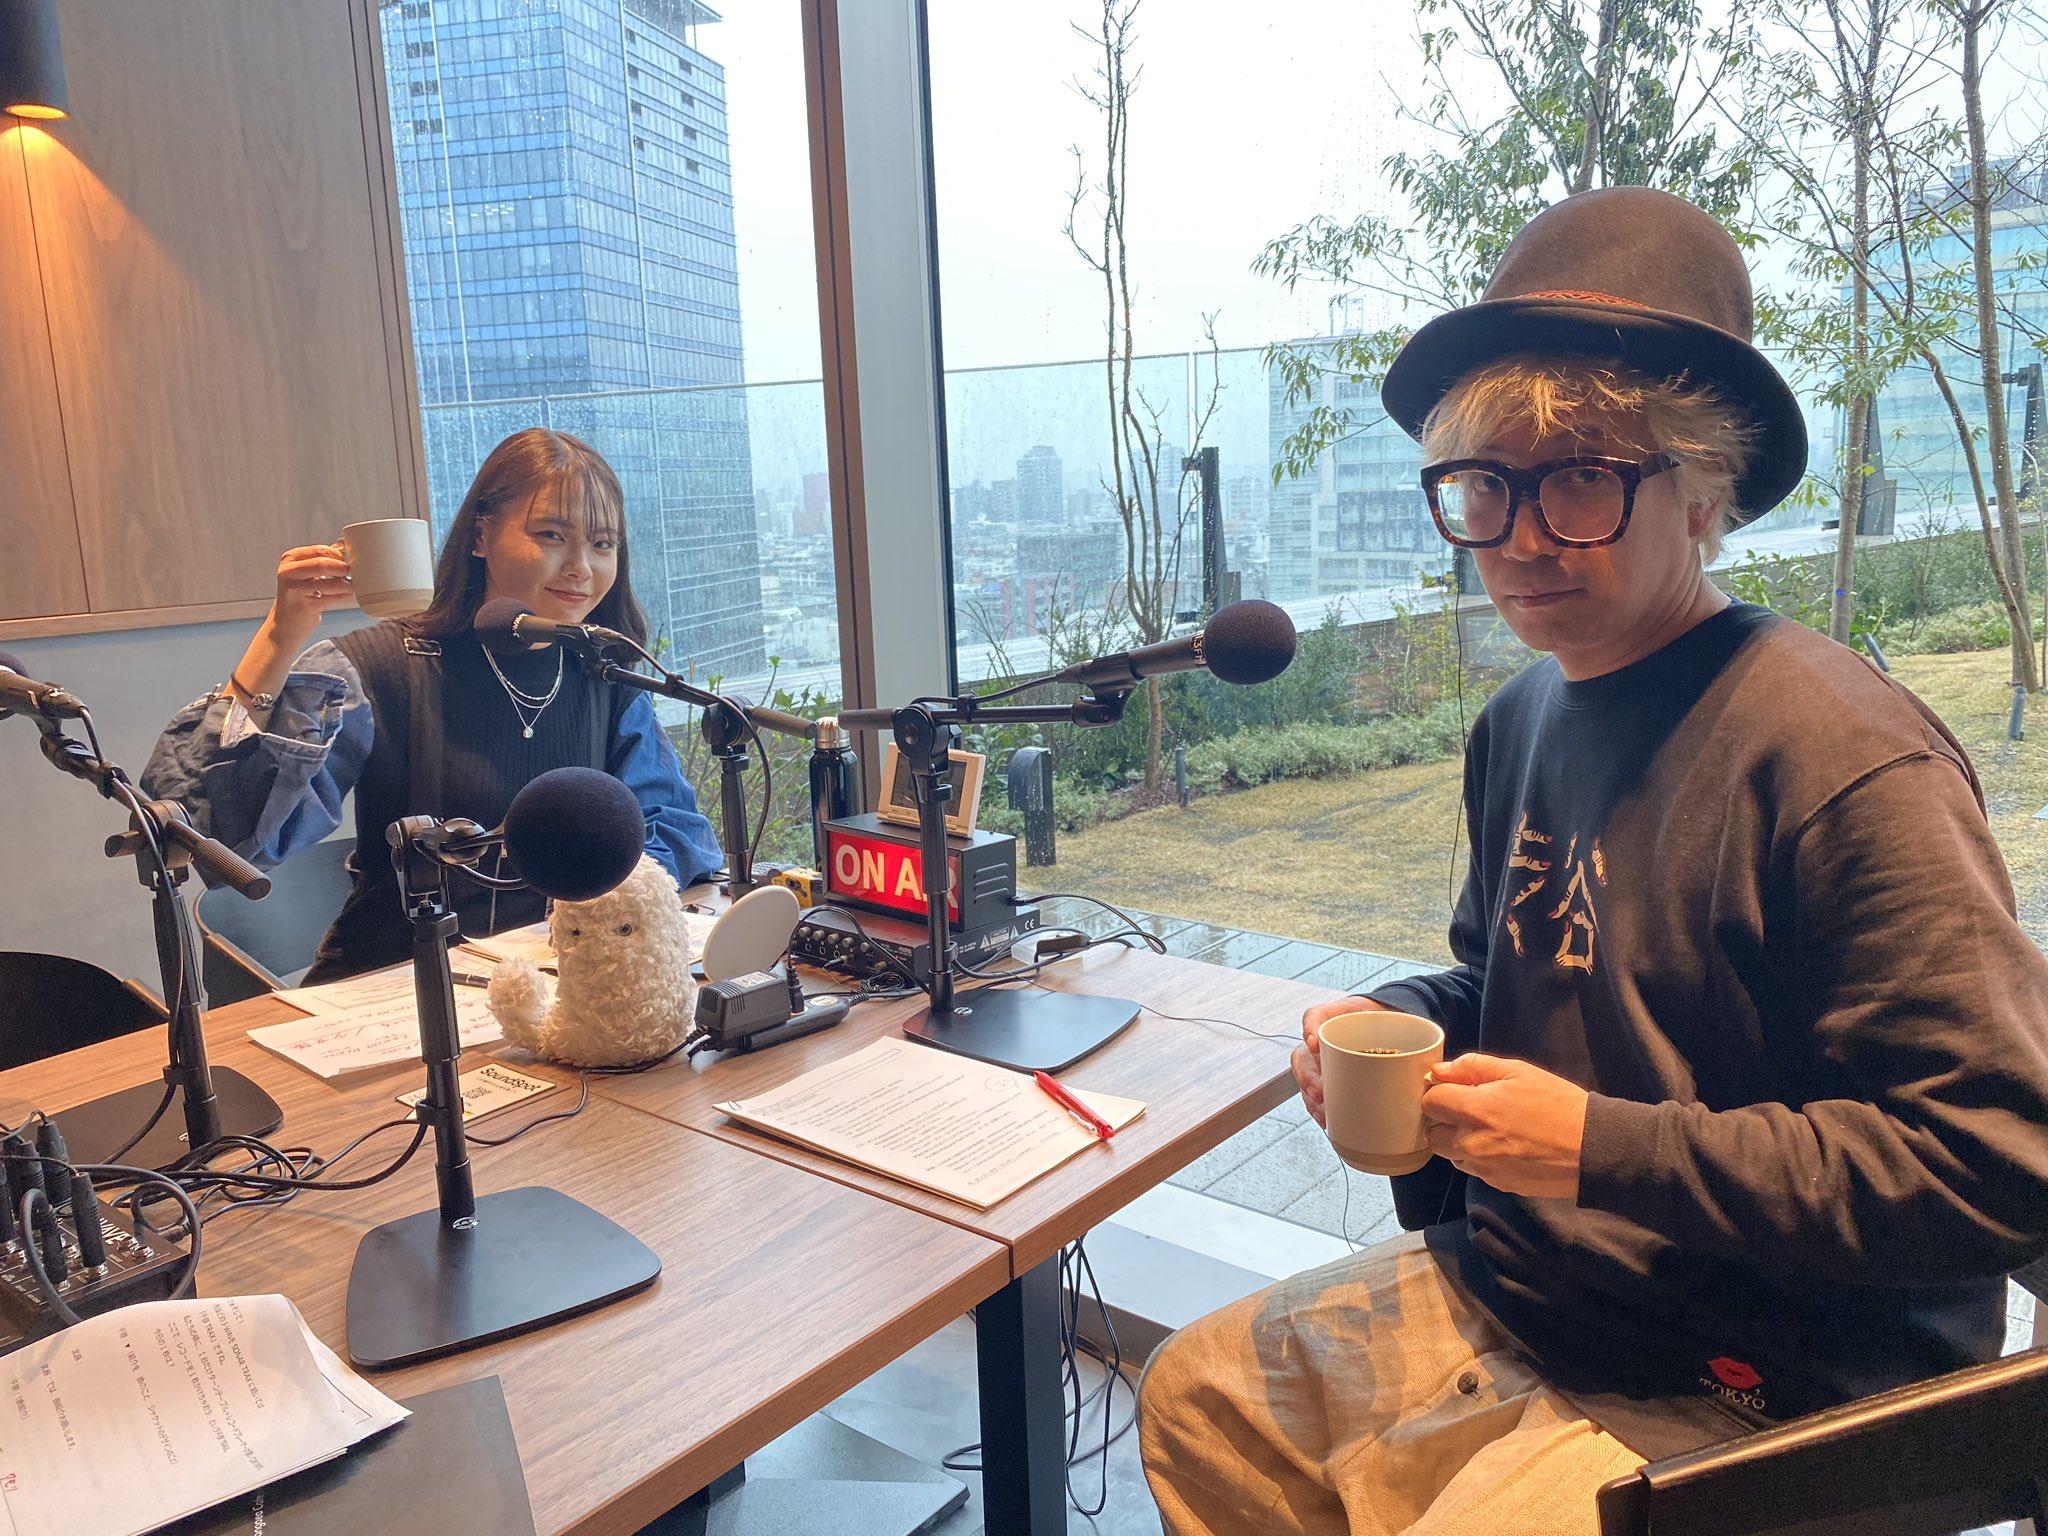 J-WAVEで放送中の番組『SHIBUYA DESIGN』